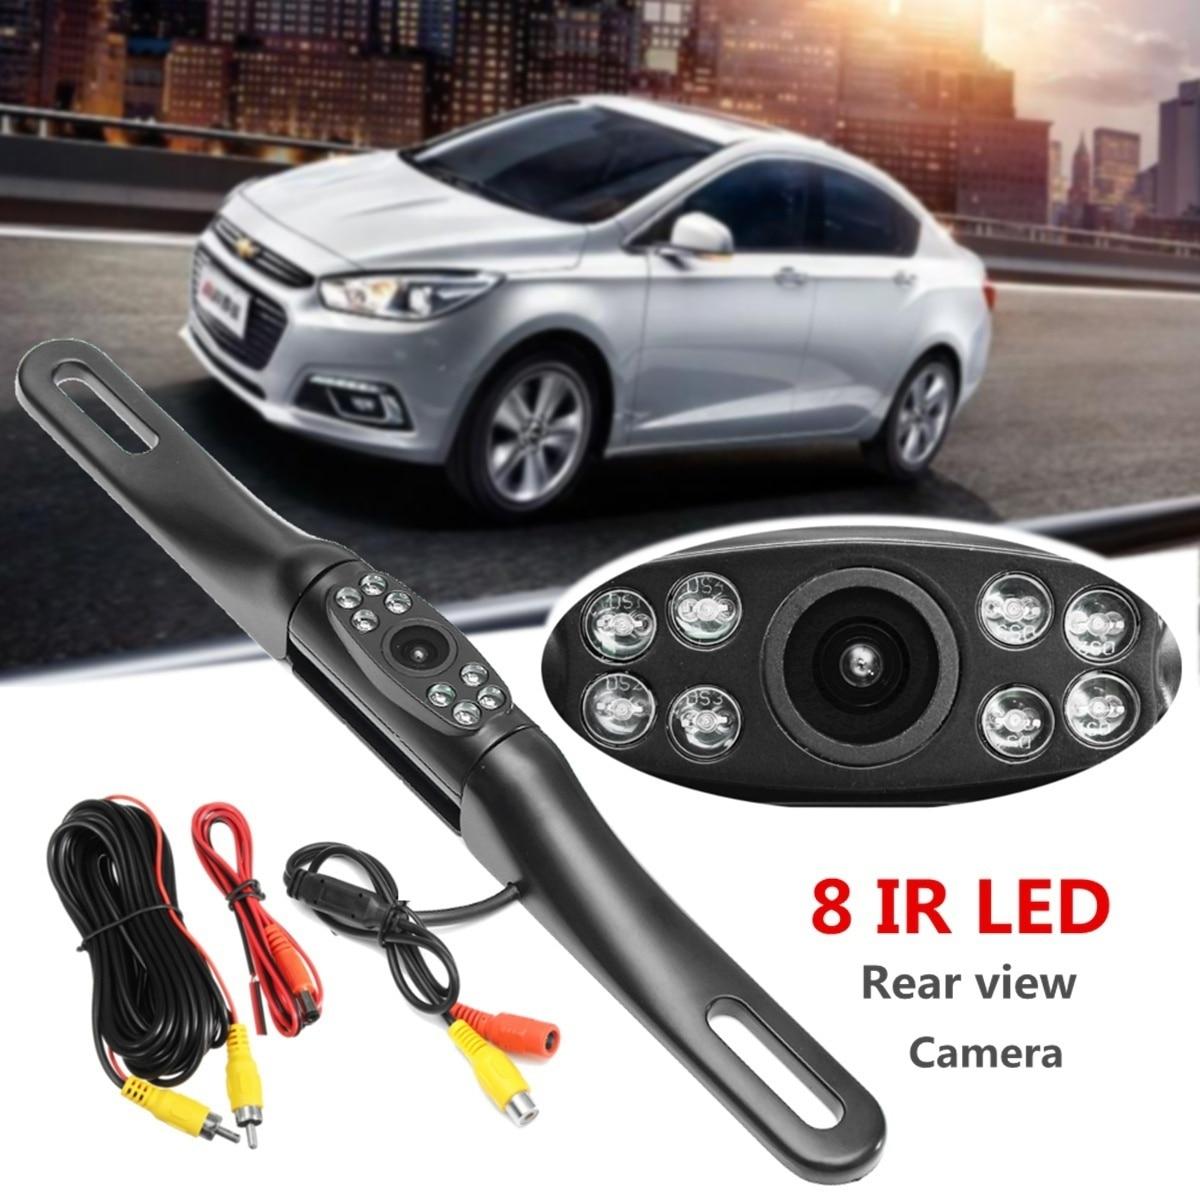 Car IR Night Vision 170 Degree Rear View Camera License Plate Frame Car Reverse Camera Waterproof Backup Camera For Monitor 5